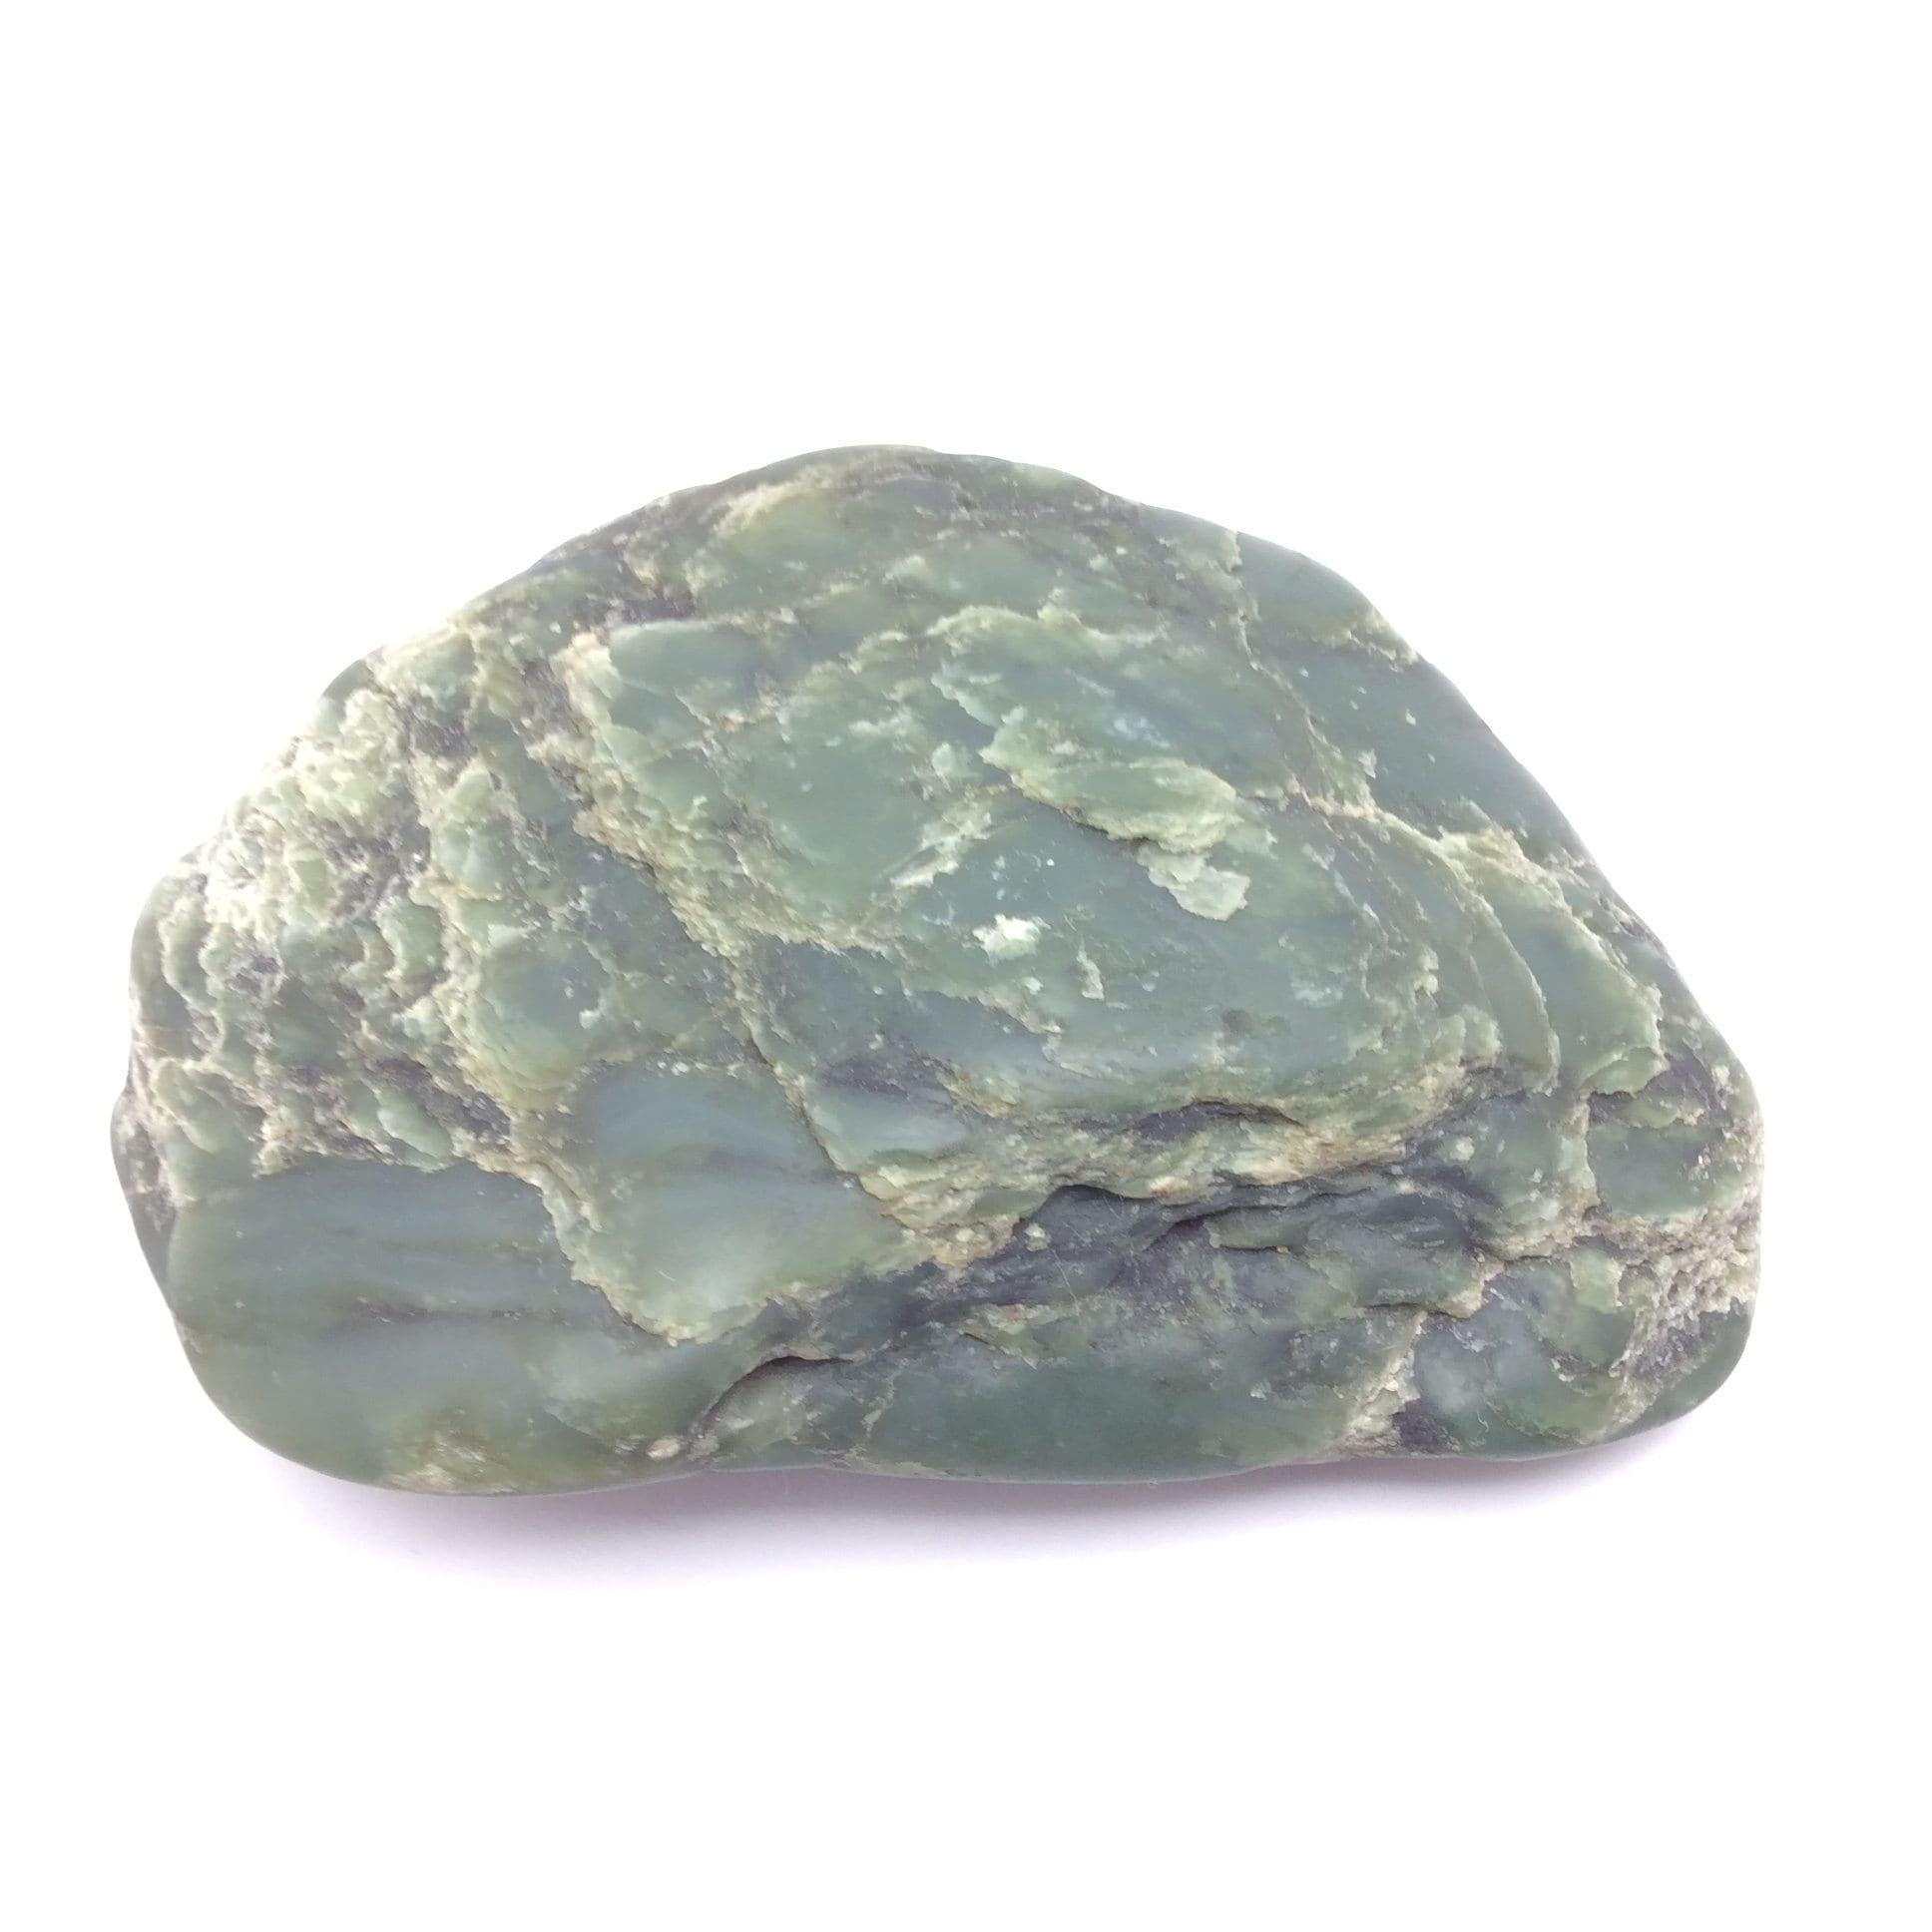 Big Sur Jade Pebble Specimen Green Ocean Polished Nephrite Gem Stone Monterey California #12